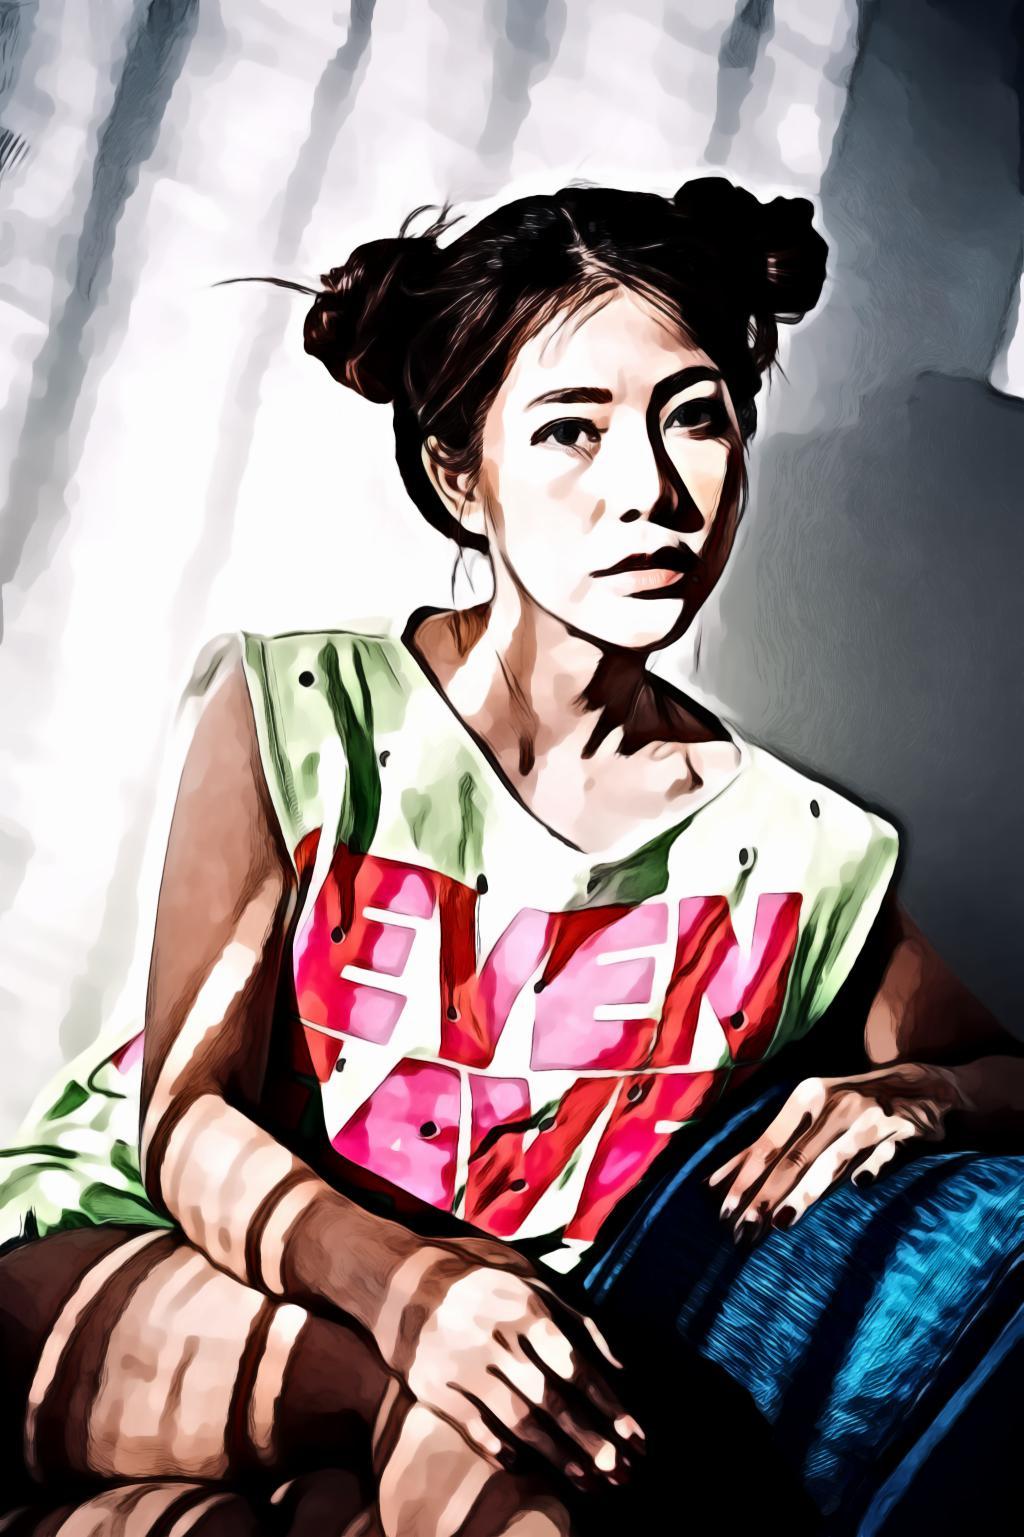 Woman wearing green and pink sleeveless mini dress sitting on blue sofa